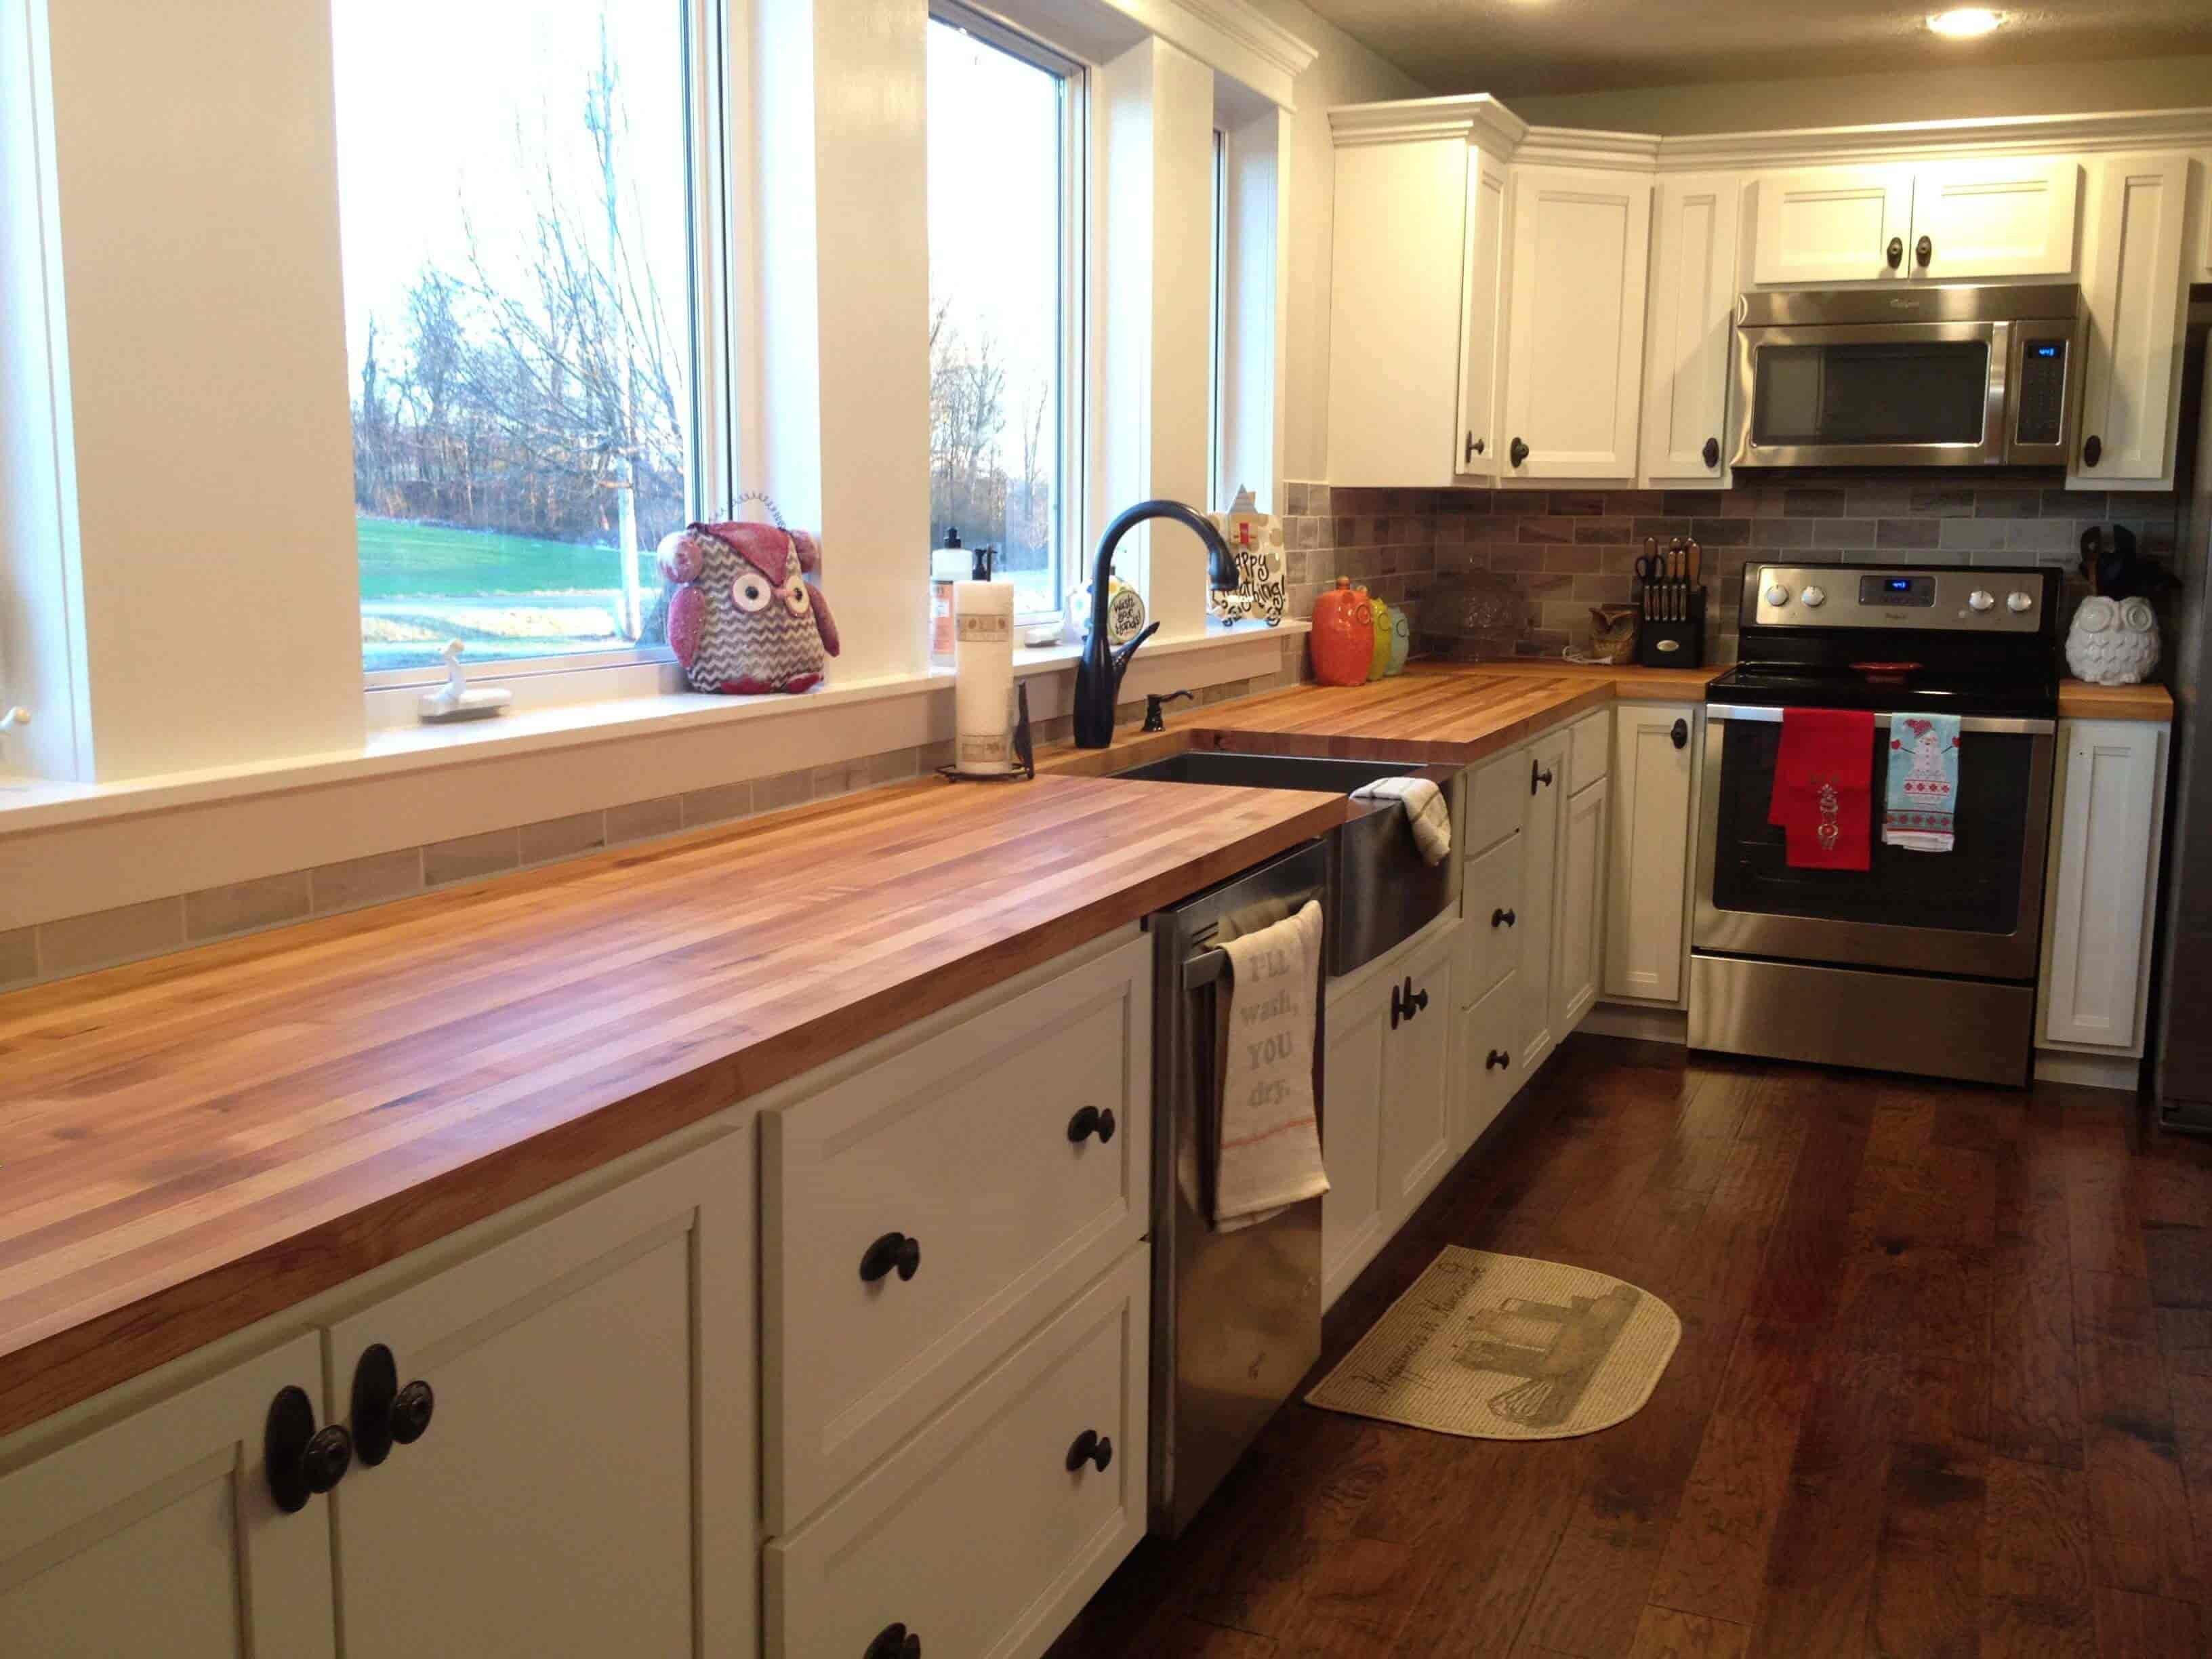 Use Modern Wood Countertops